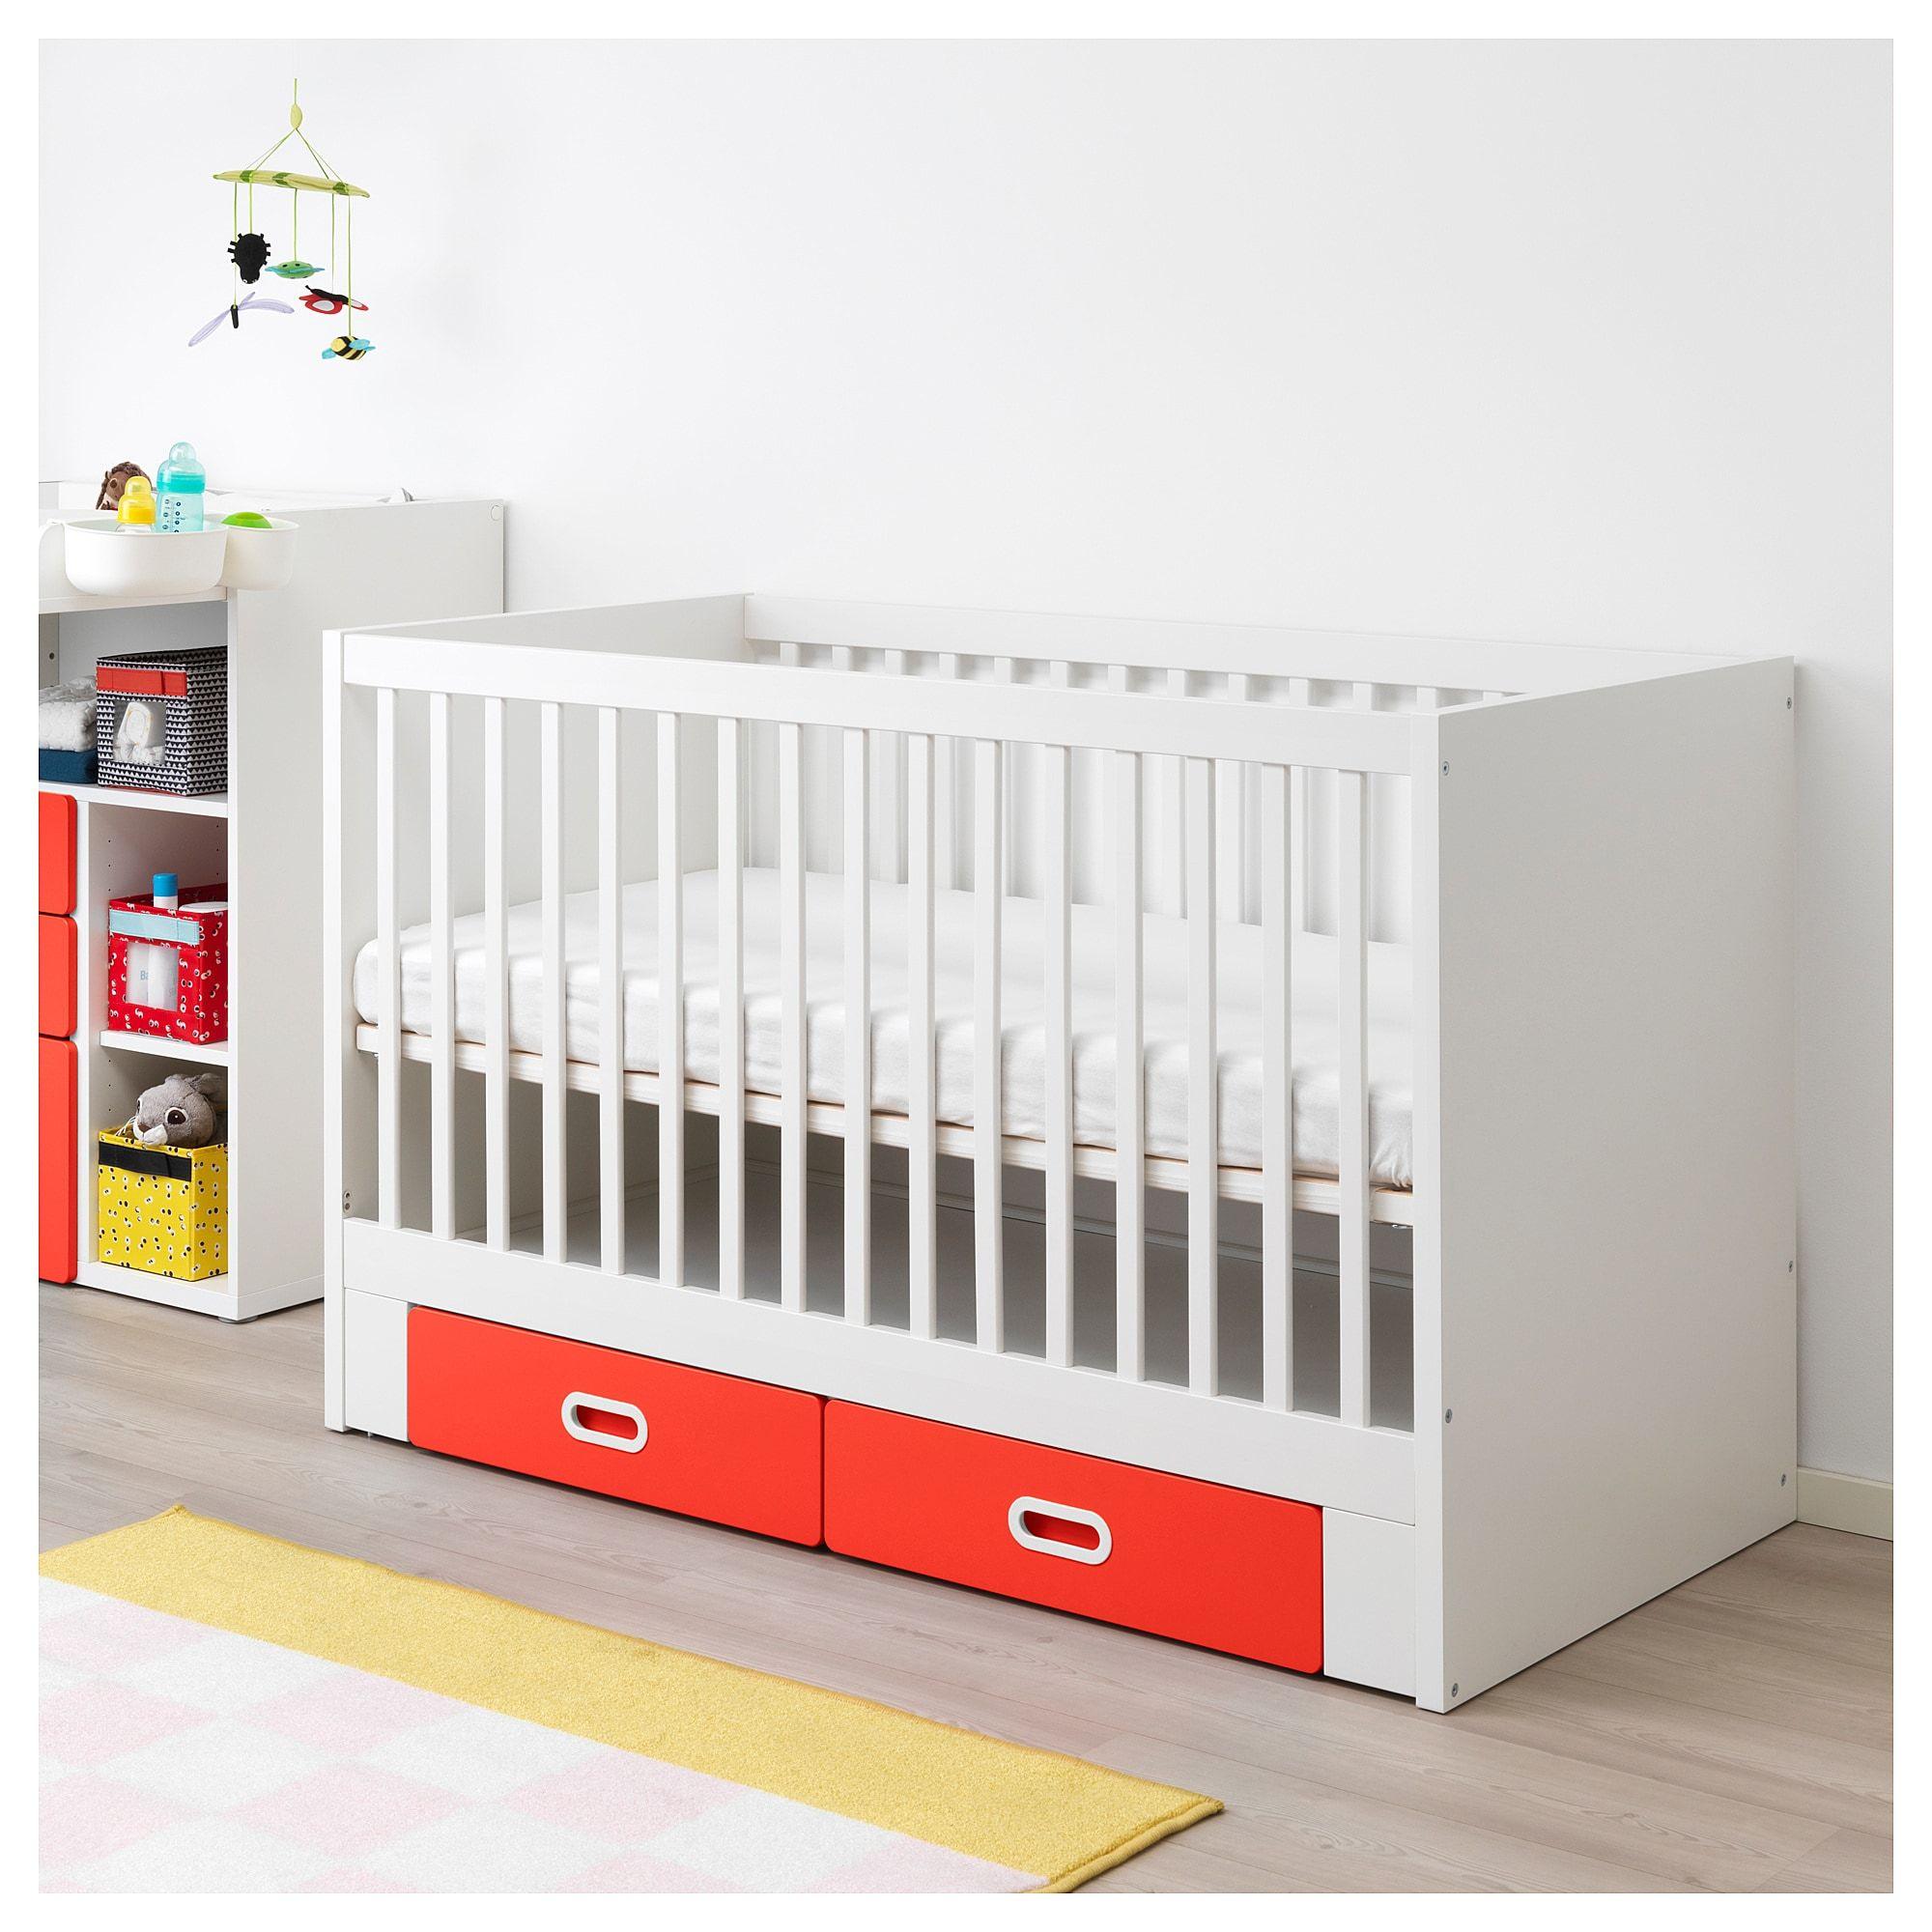 Stuva Fritids Babybett Mit Schubfachern Rot Ikea Osterreich Babybett Ikea Babybett Und Ikea Babyzimmer